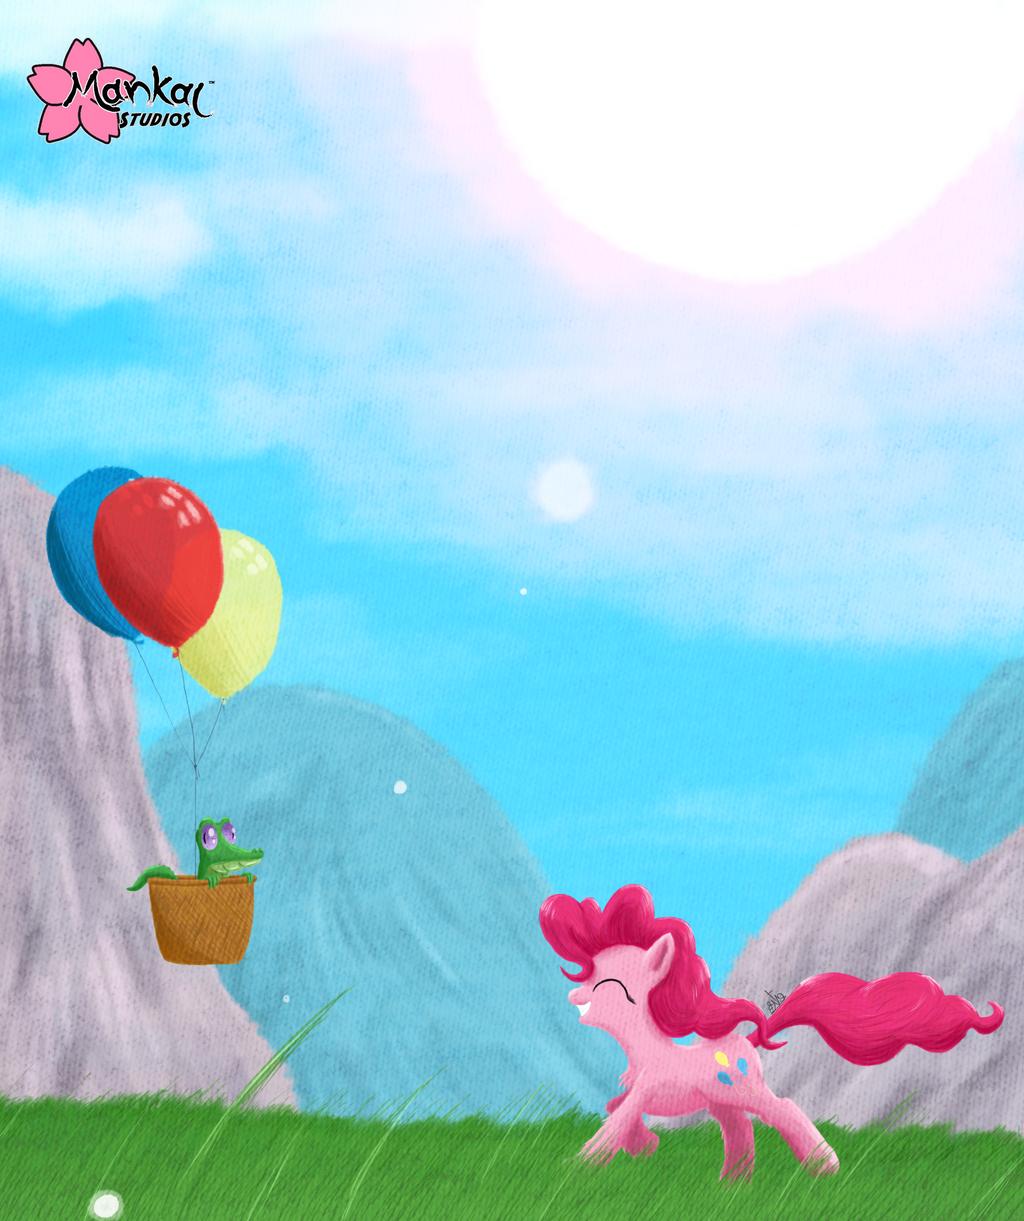 Para Flor by CloudDG